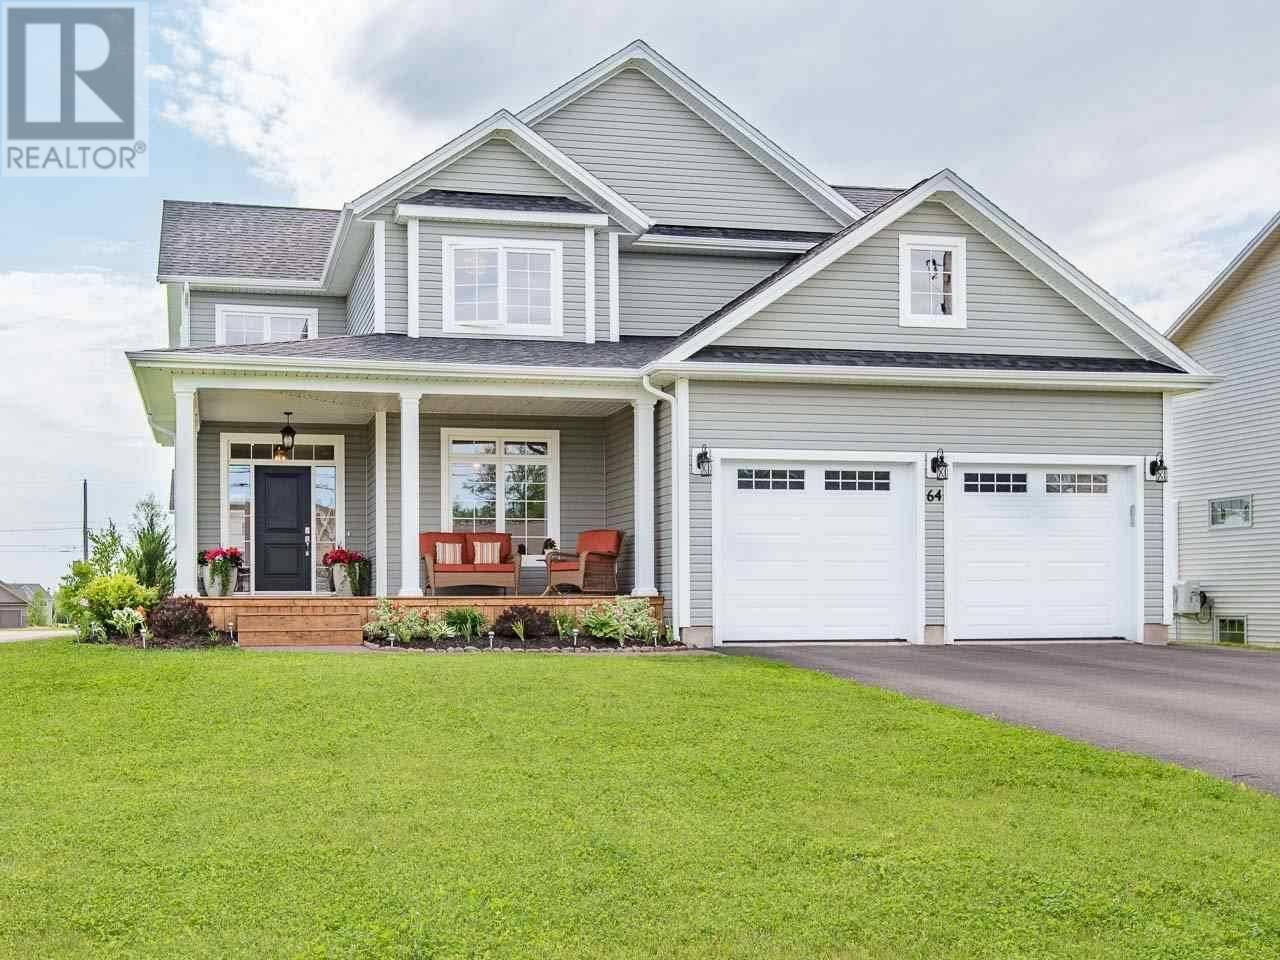 House for sale at 64 Pembroke Cres Stratford Prince Edward Island - MLS: 201923130